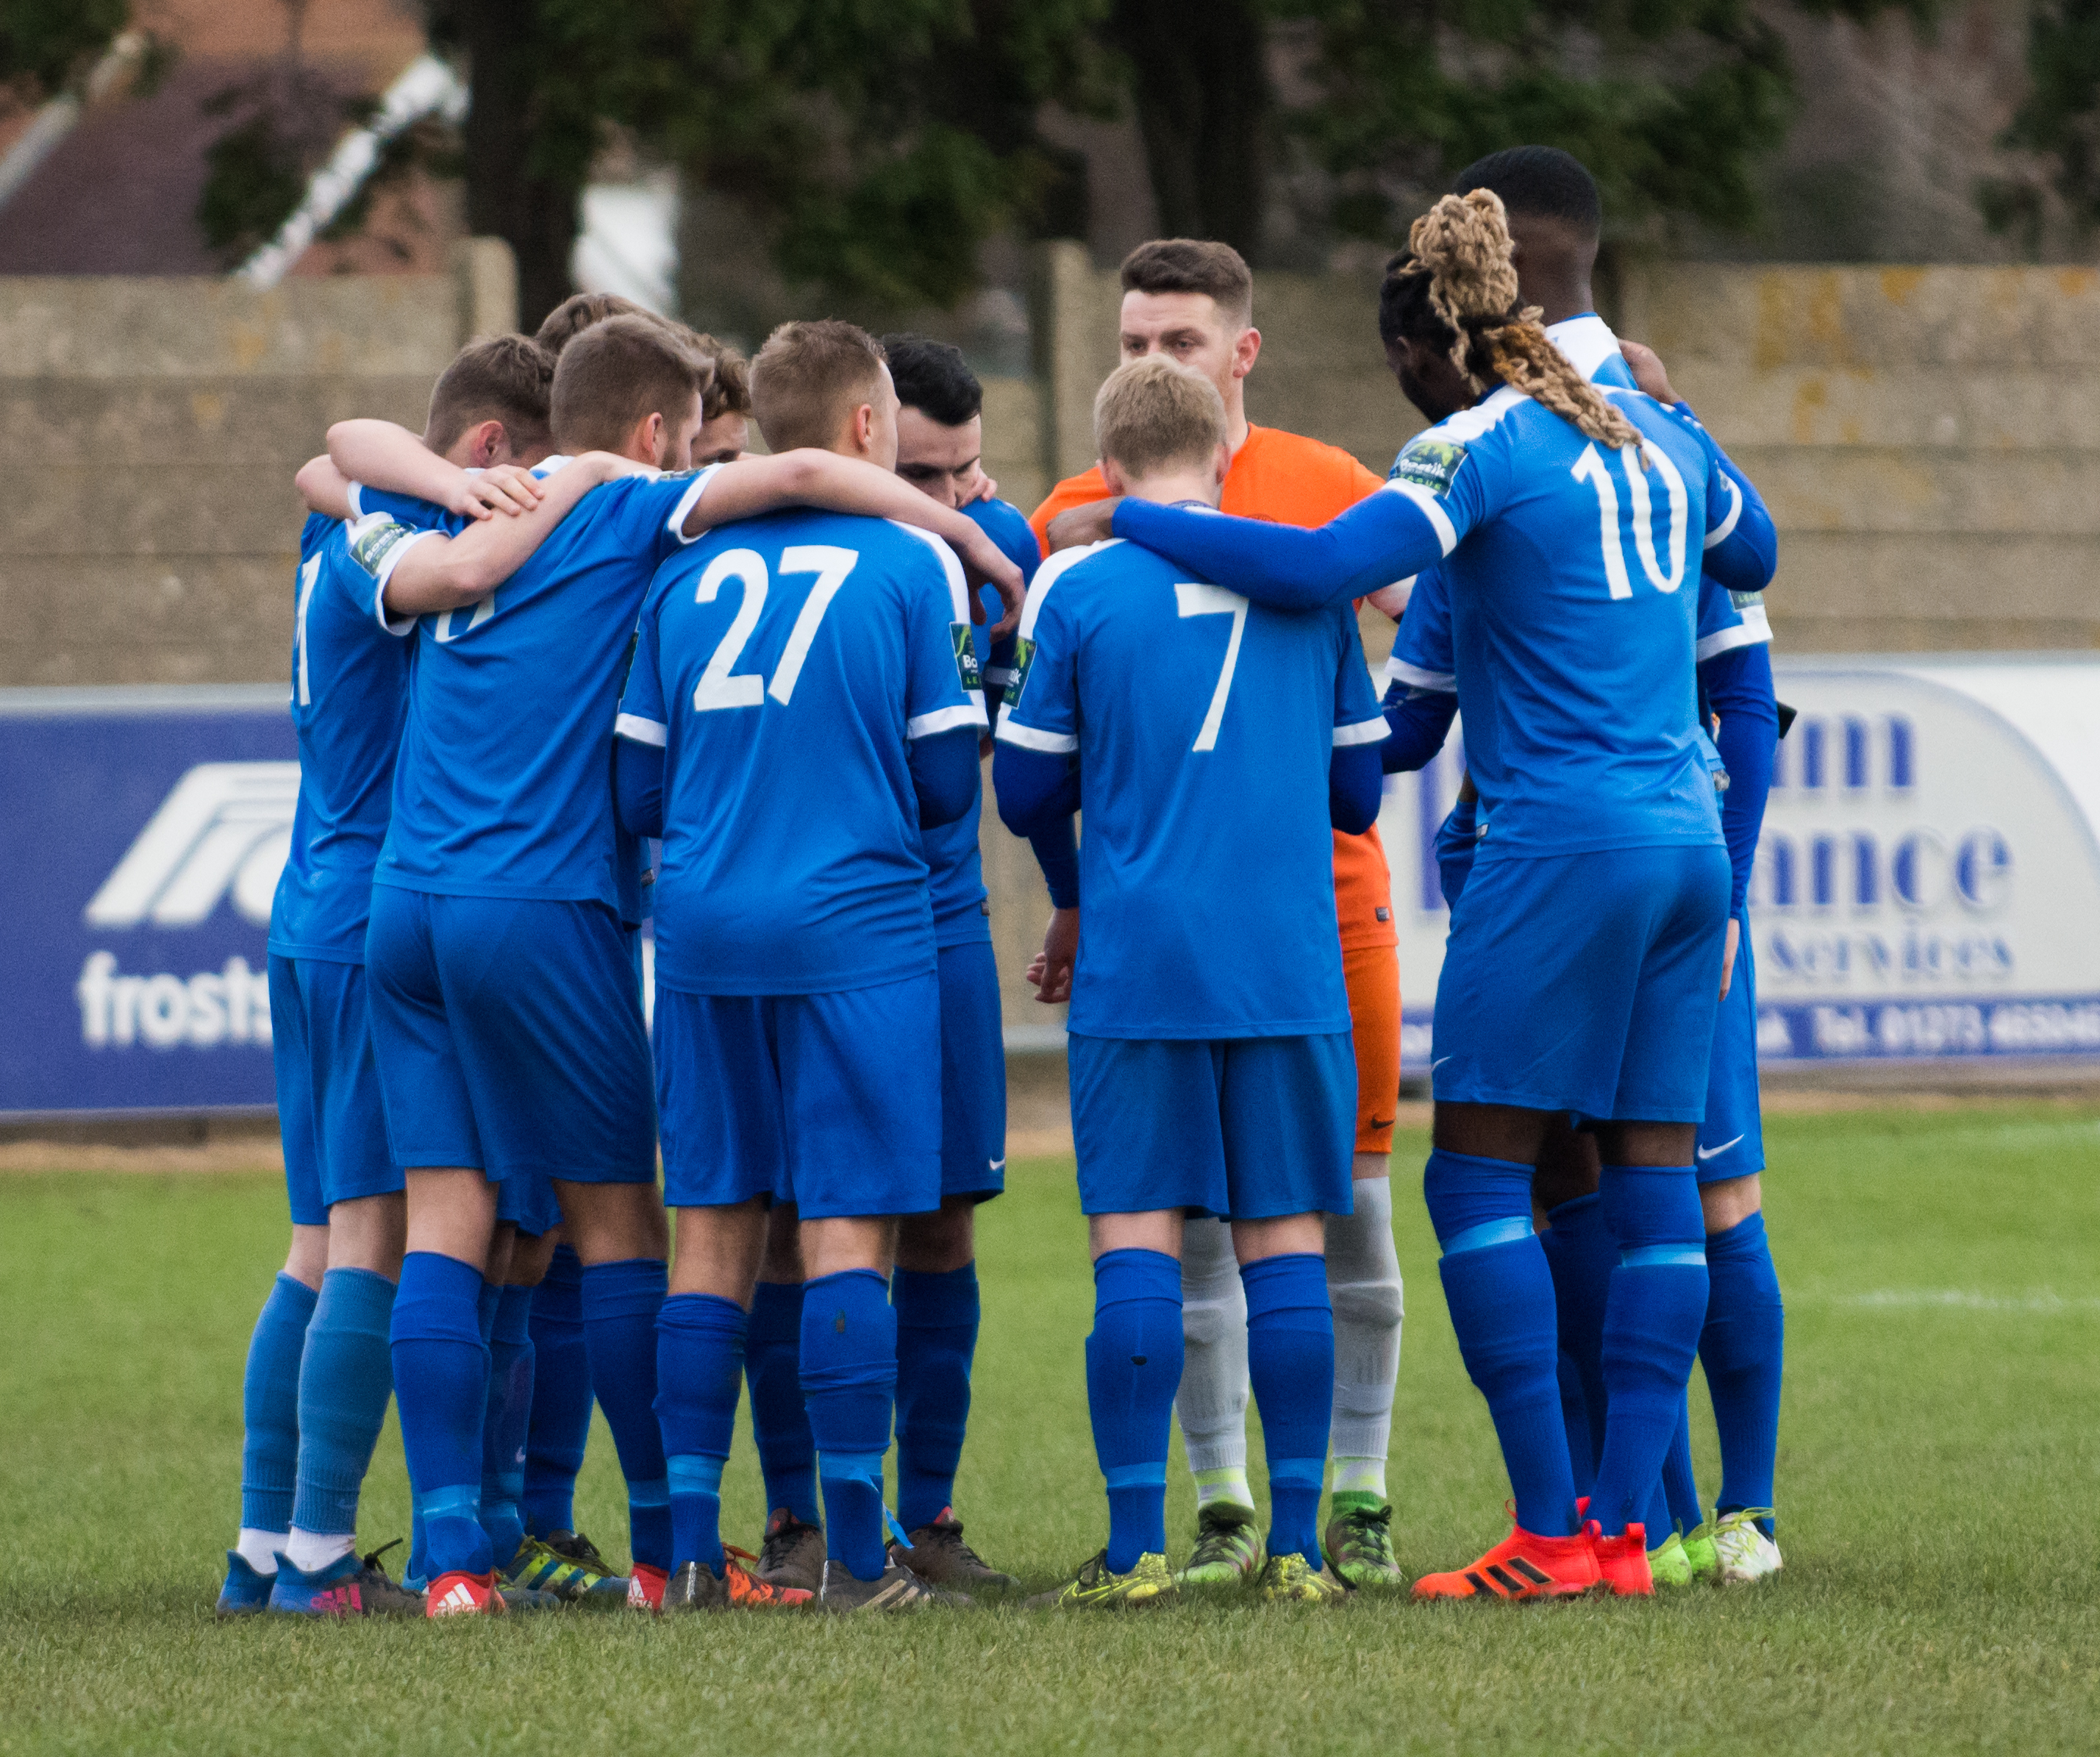 Shoreham FC vs Faversham Town 16.12.17 26